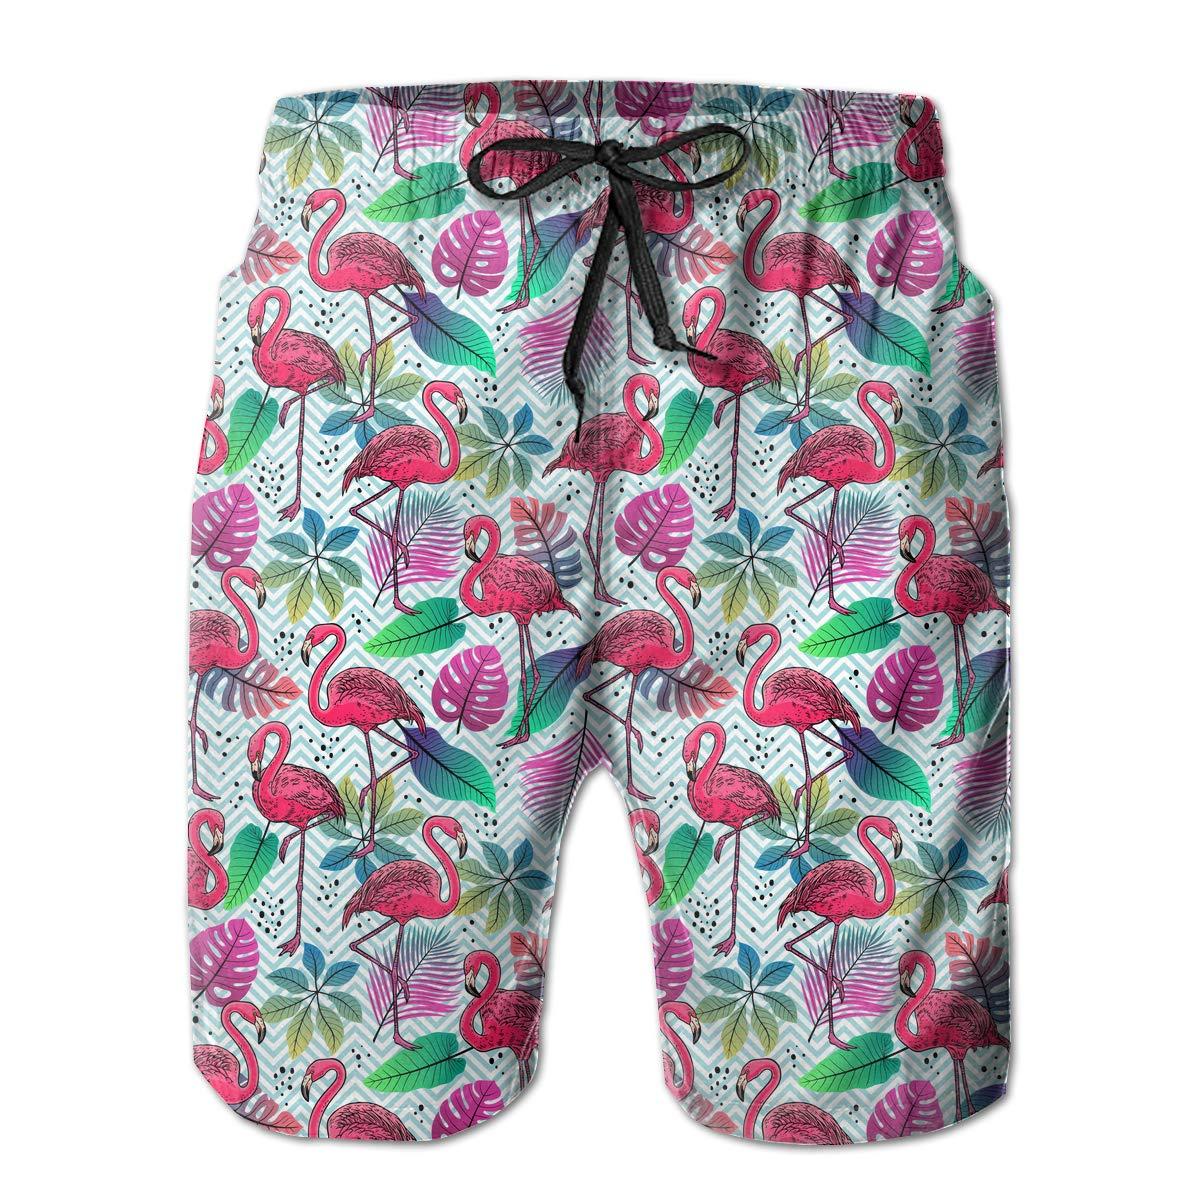 Polyester Pink Flamingos Palm Leaves Pattern Beachwear with Pockets Xk7@KU Mens Quick Dry Swim Trunks